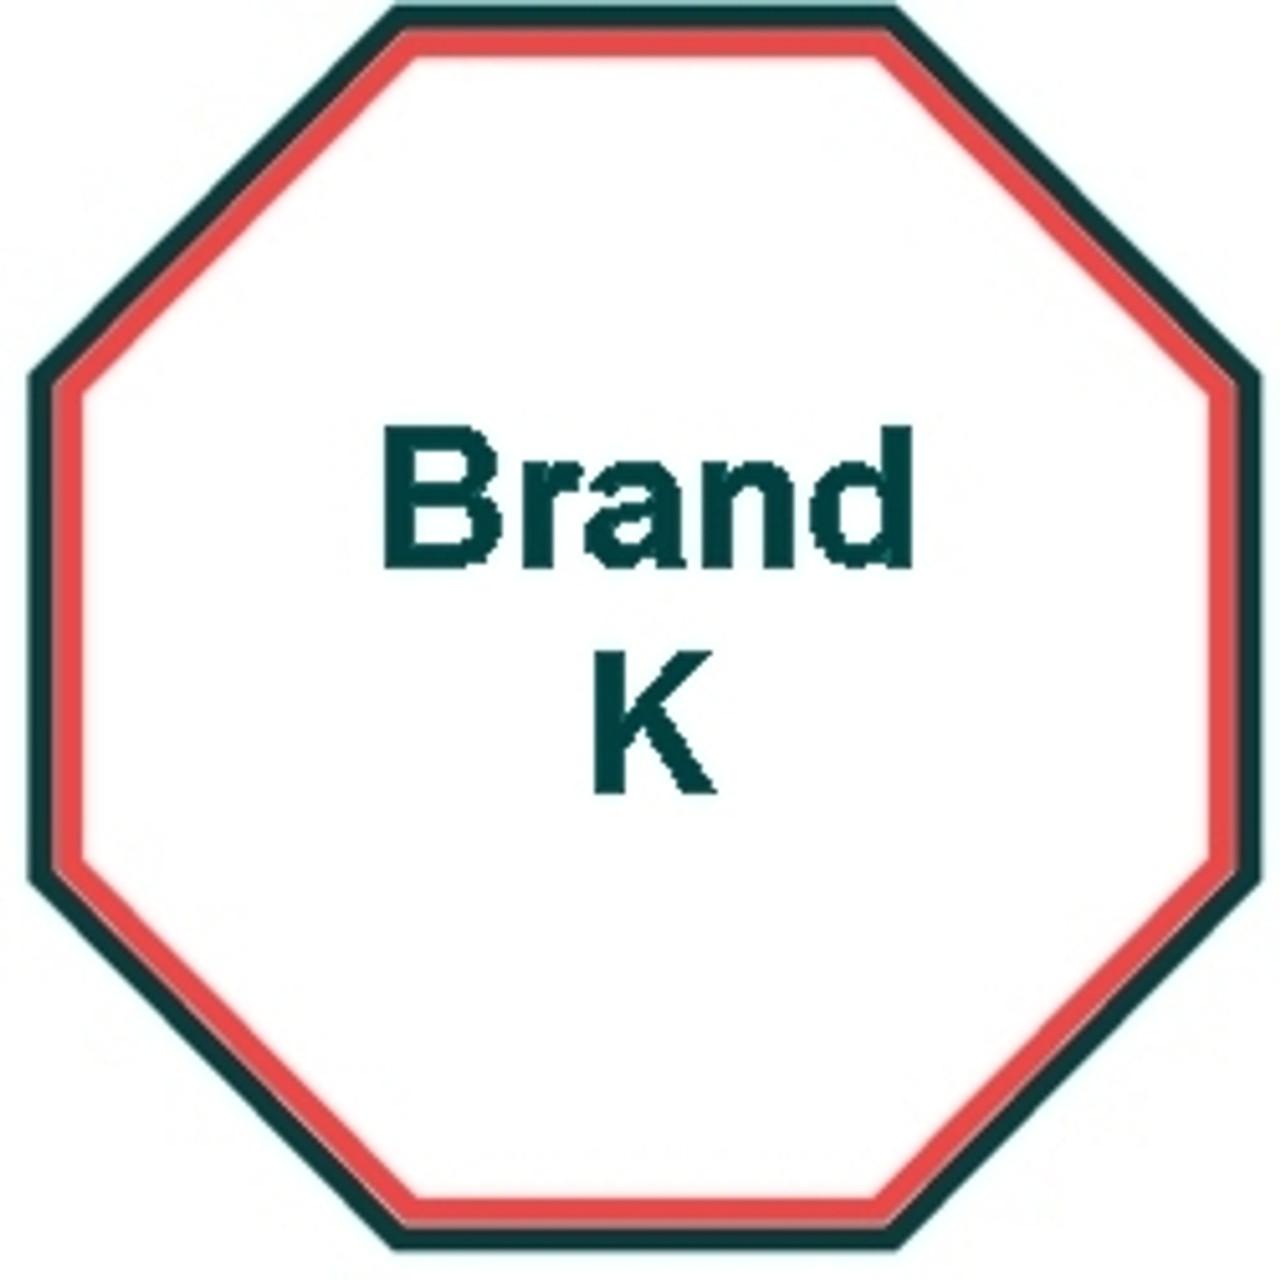 Brand (K)